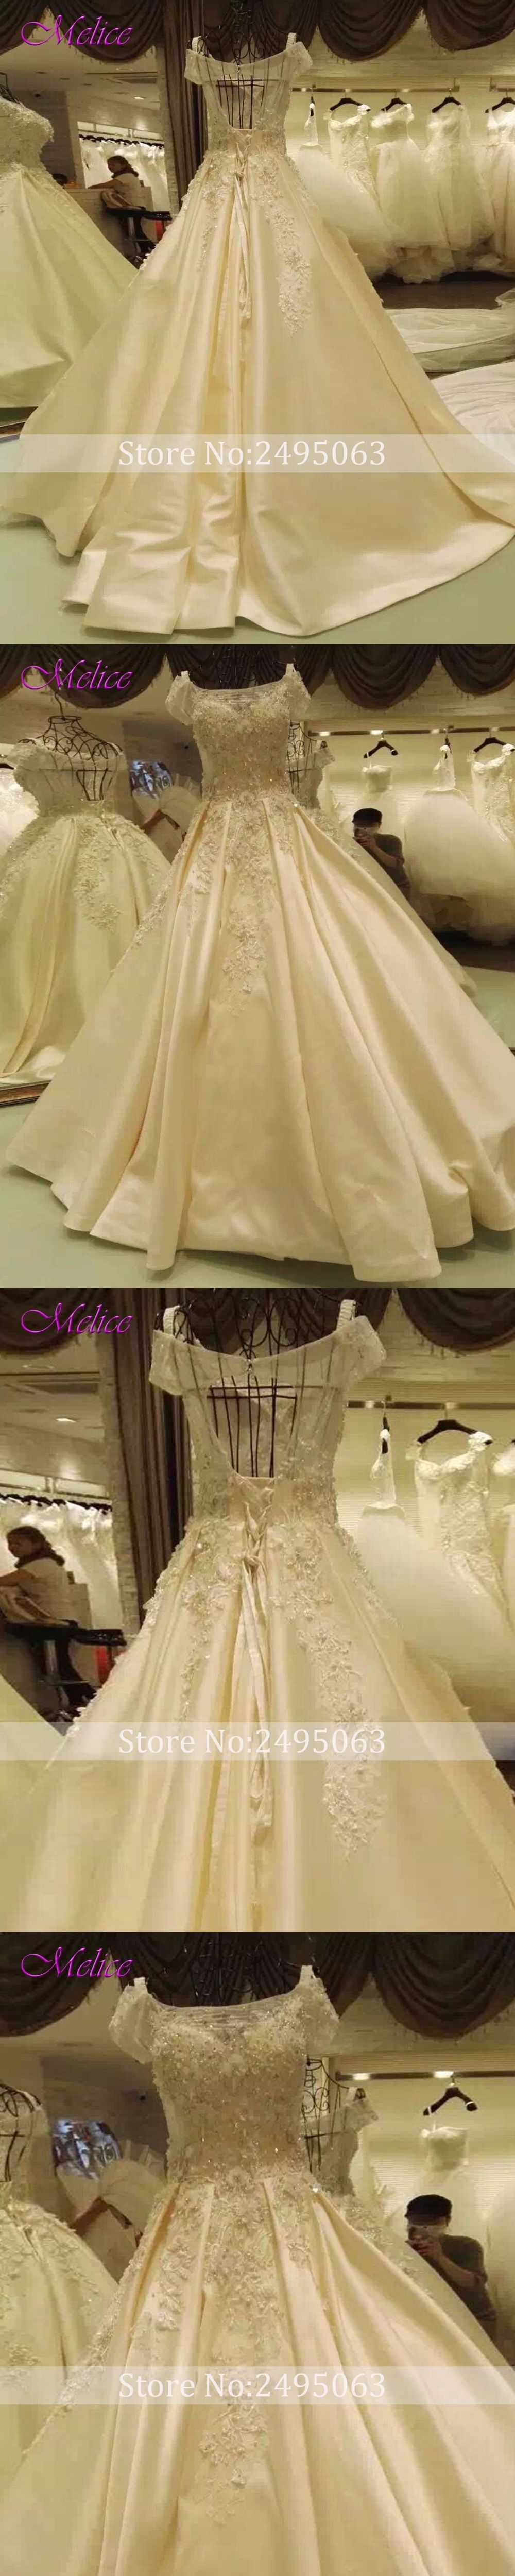 Melice luxury appliques short sleeve flowers aline wedding dress